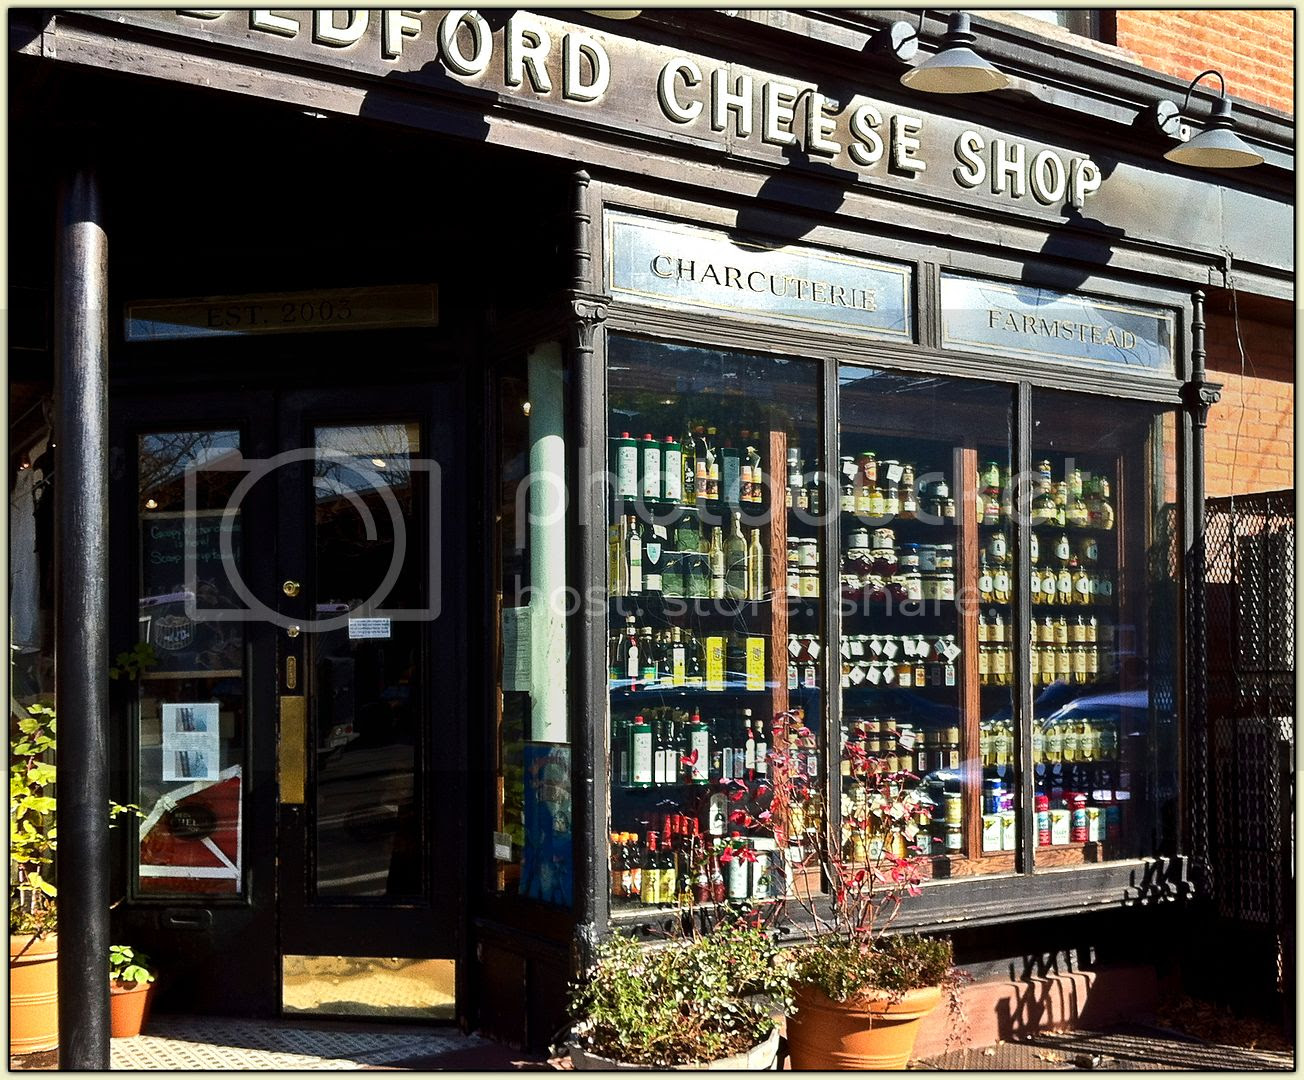 Bedford Cheese Shop Exterior